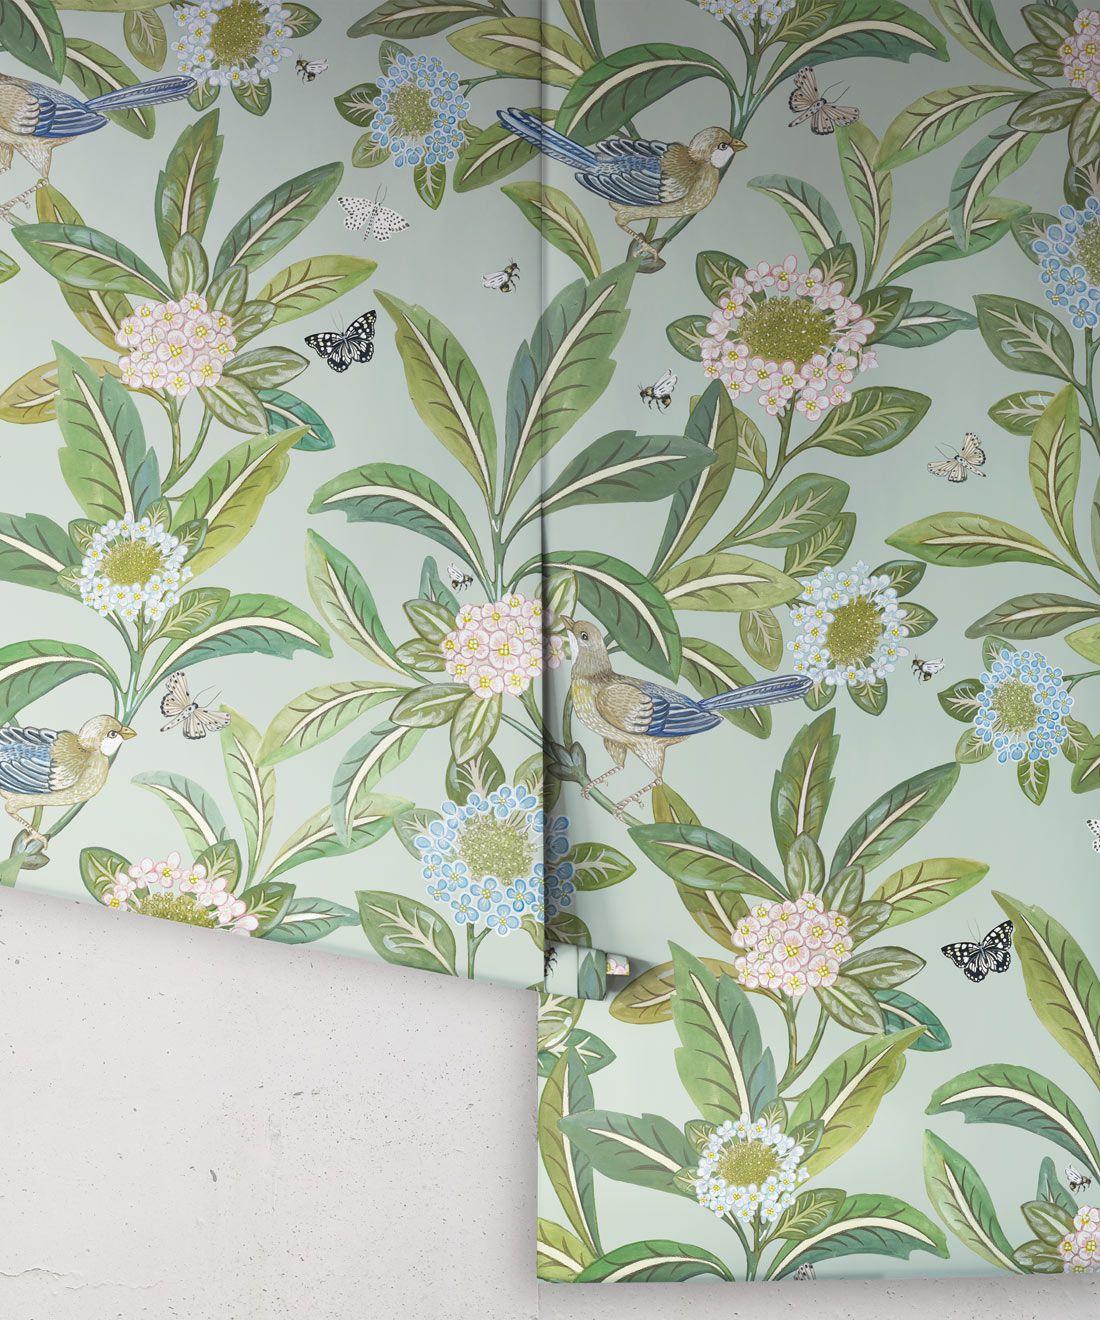 Summer Garden Wallpaper • Aqua Wallpaper • Floral Wallpaper Rolls